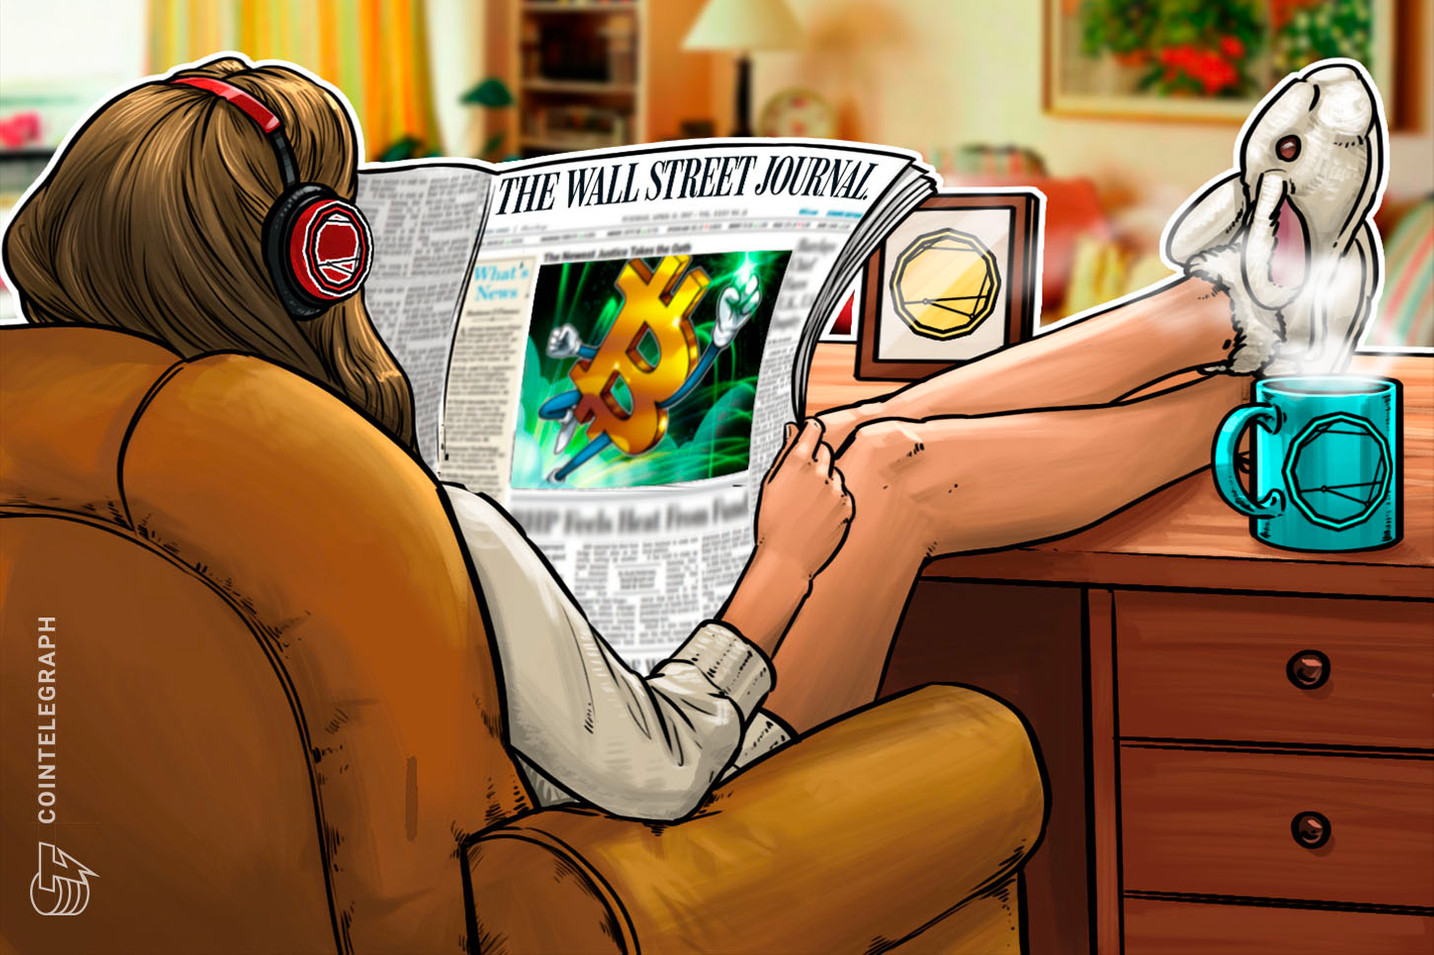 Bitcoin Wall Street Journal'ın ön sayfasında!